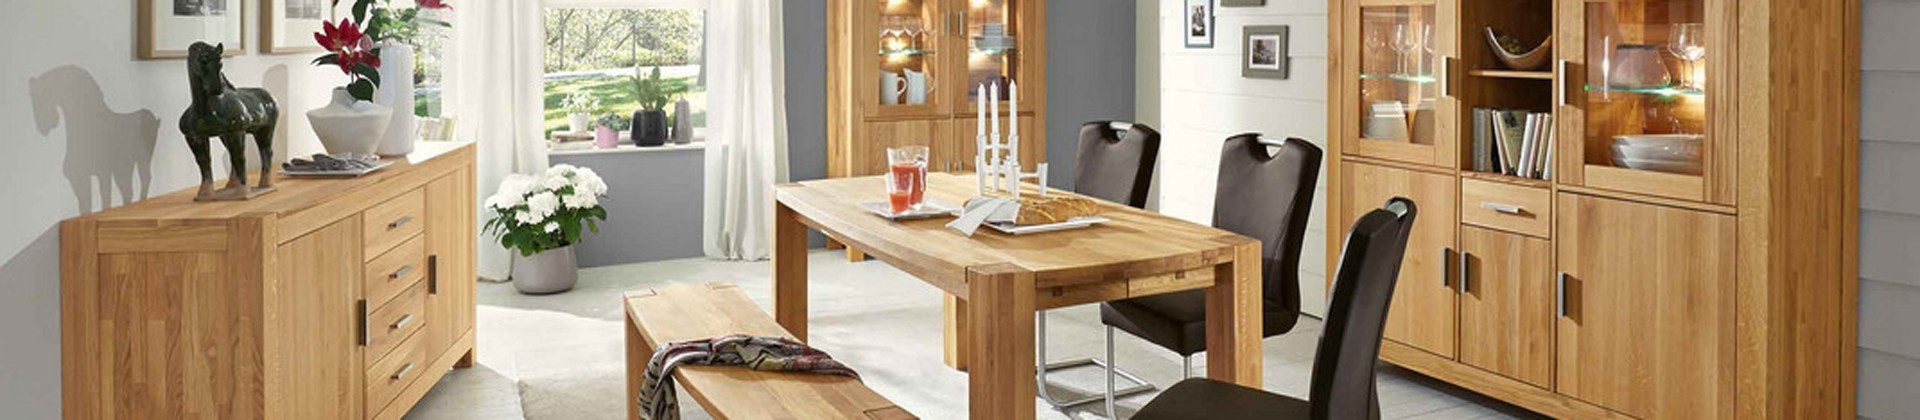 chambres compl tes meubles leitenberg. Black Bedroom Furniture Sets. Home Design Ideas